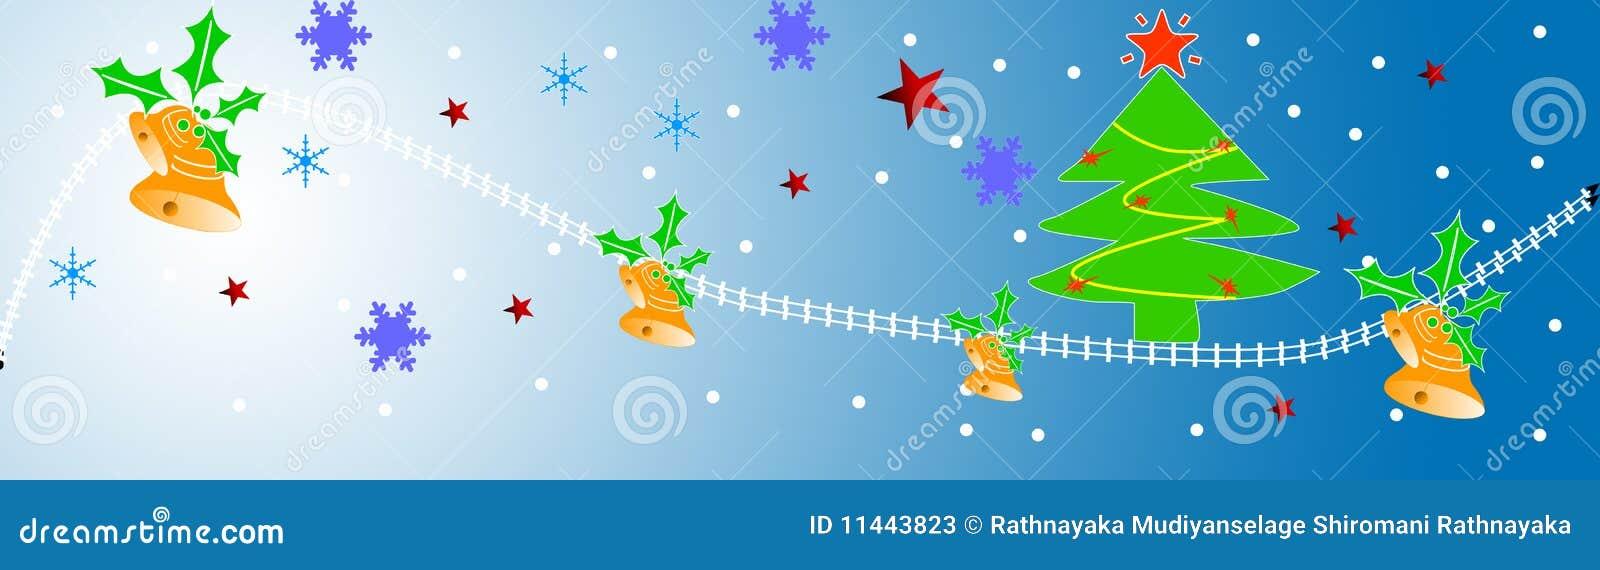 Christmas header stock illustration. Illustration of merry - 11443823